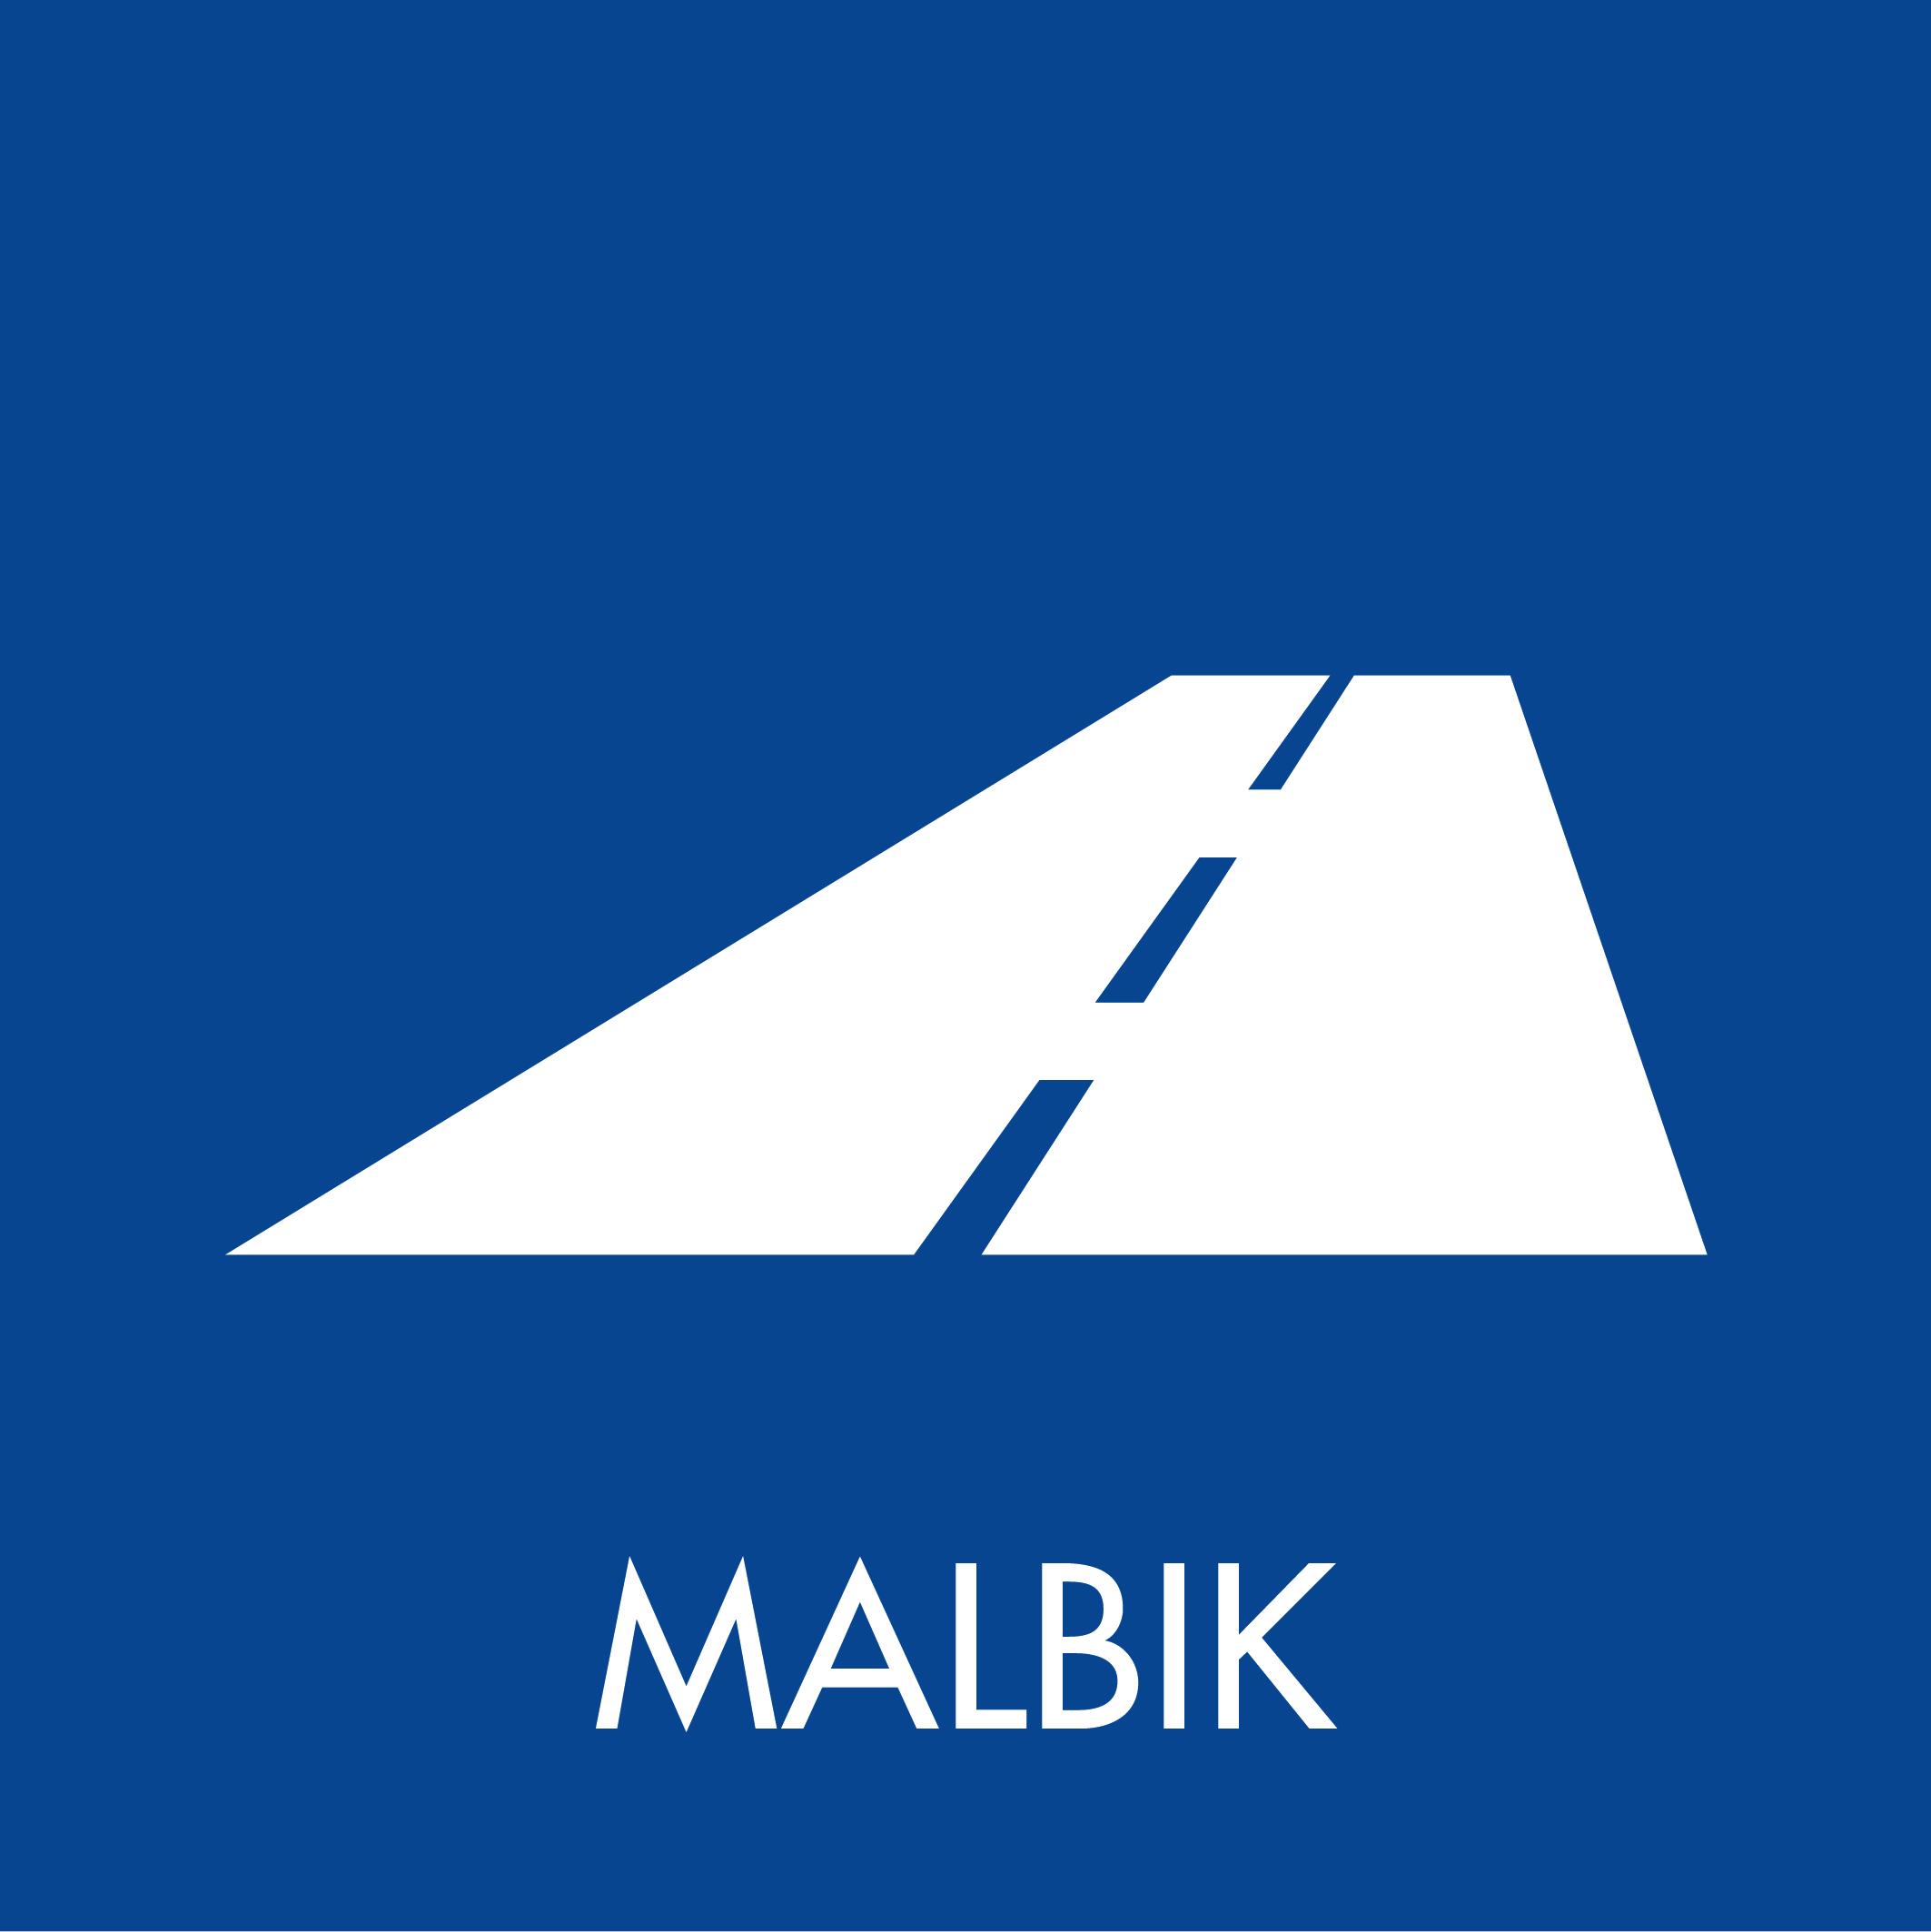 Malbik